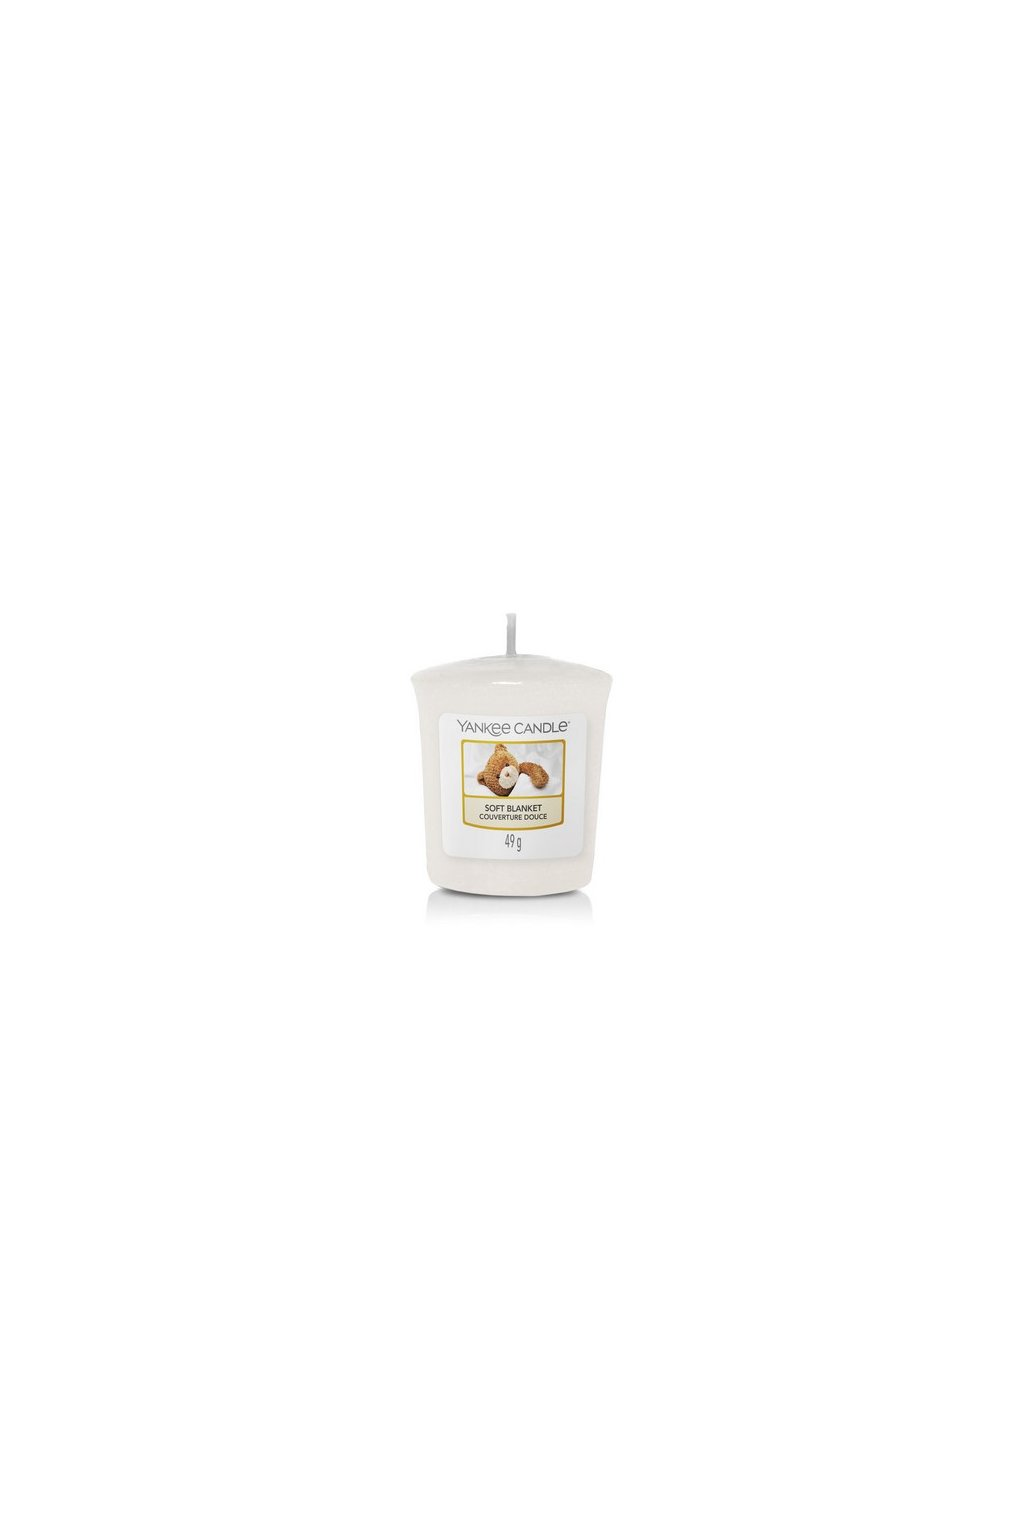 Yankee Candle SOFT BLANKET 49g